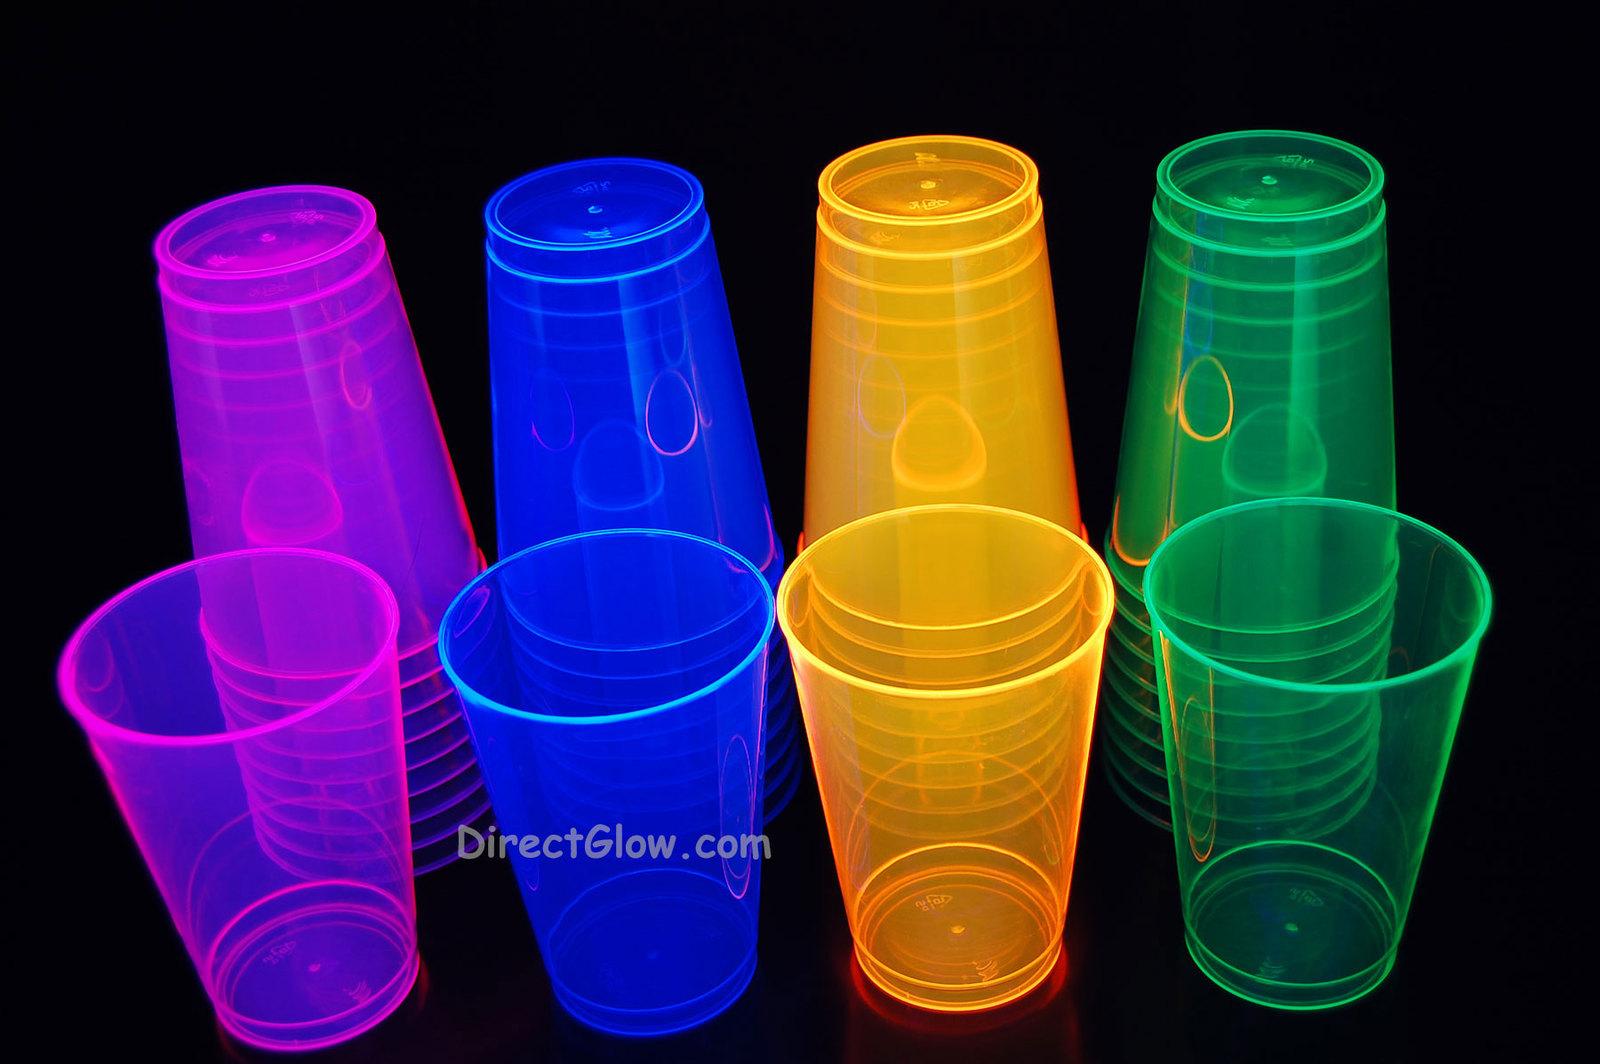 12oz 40ct blacklight cups1